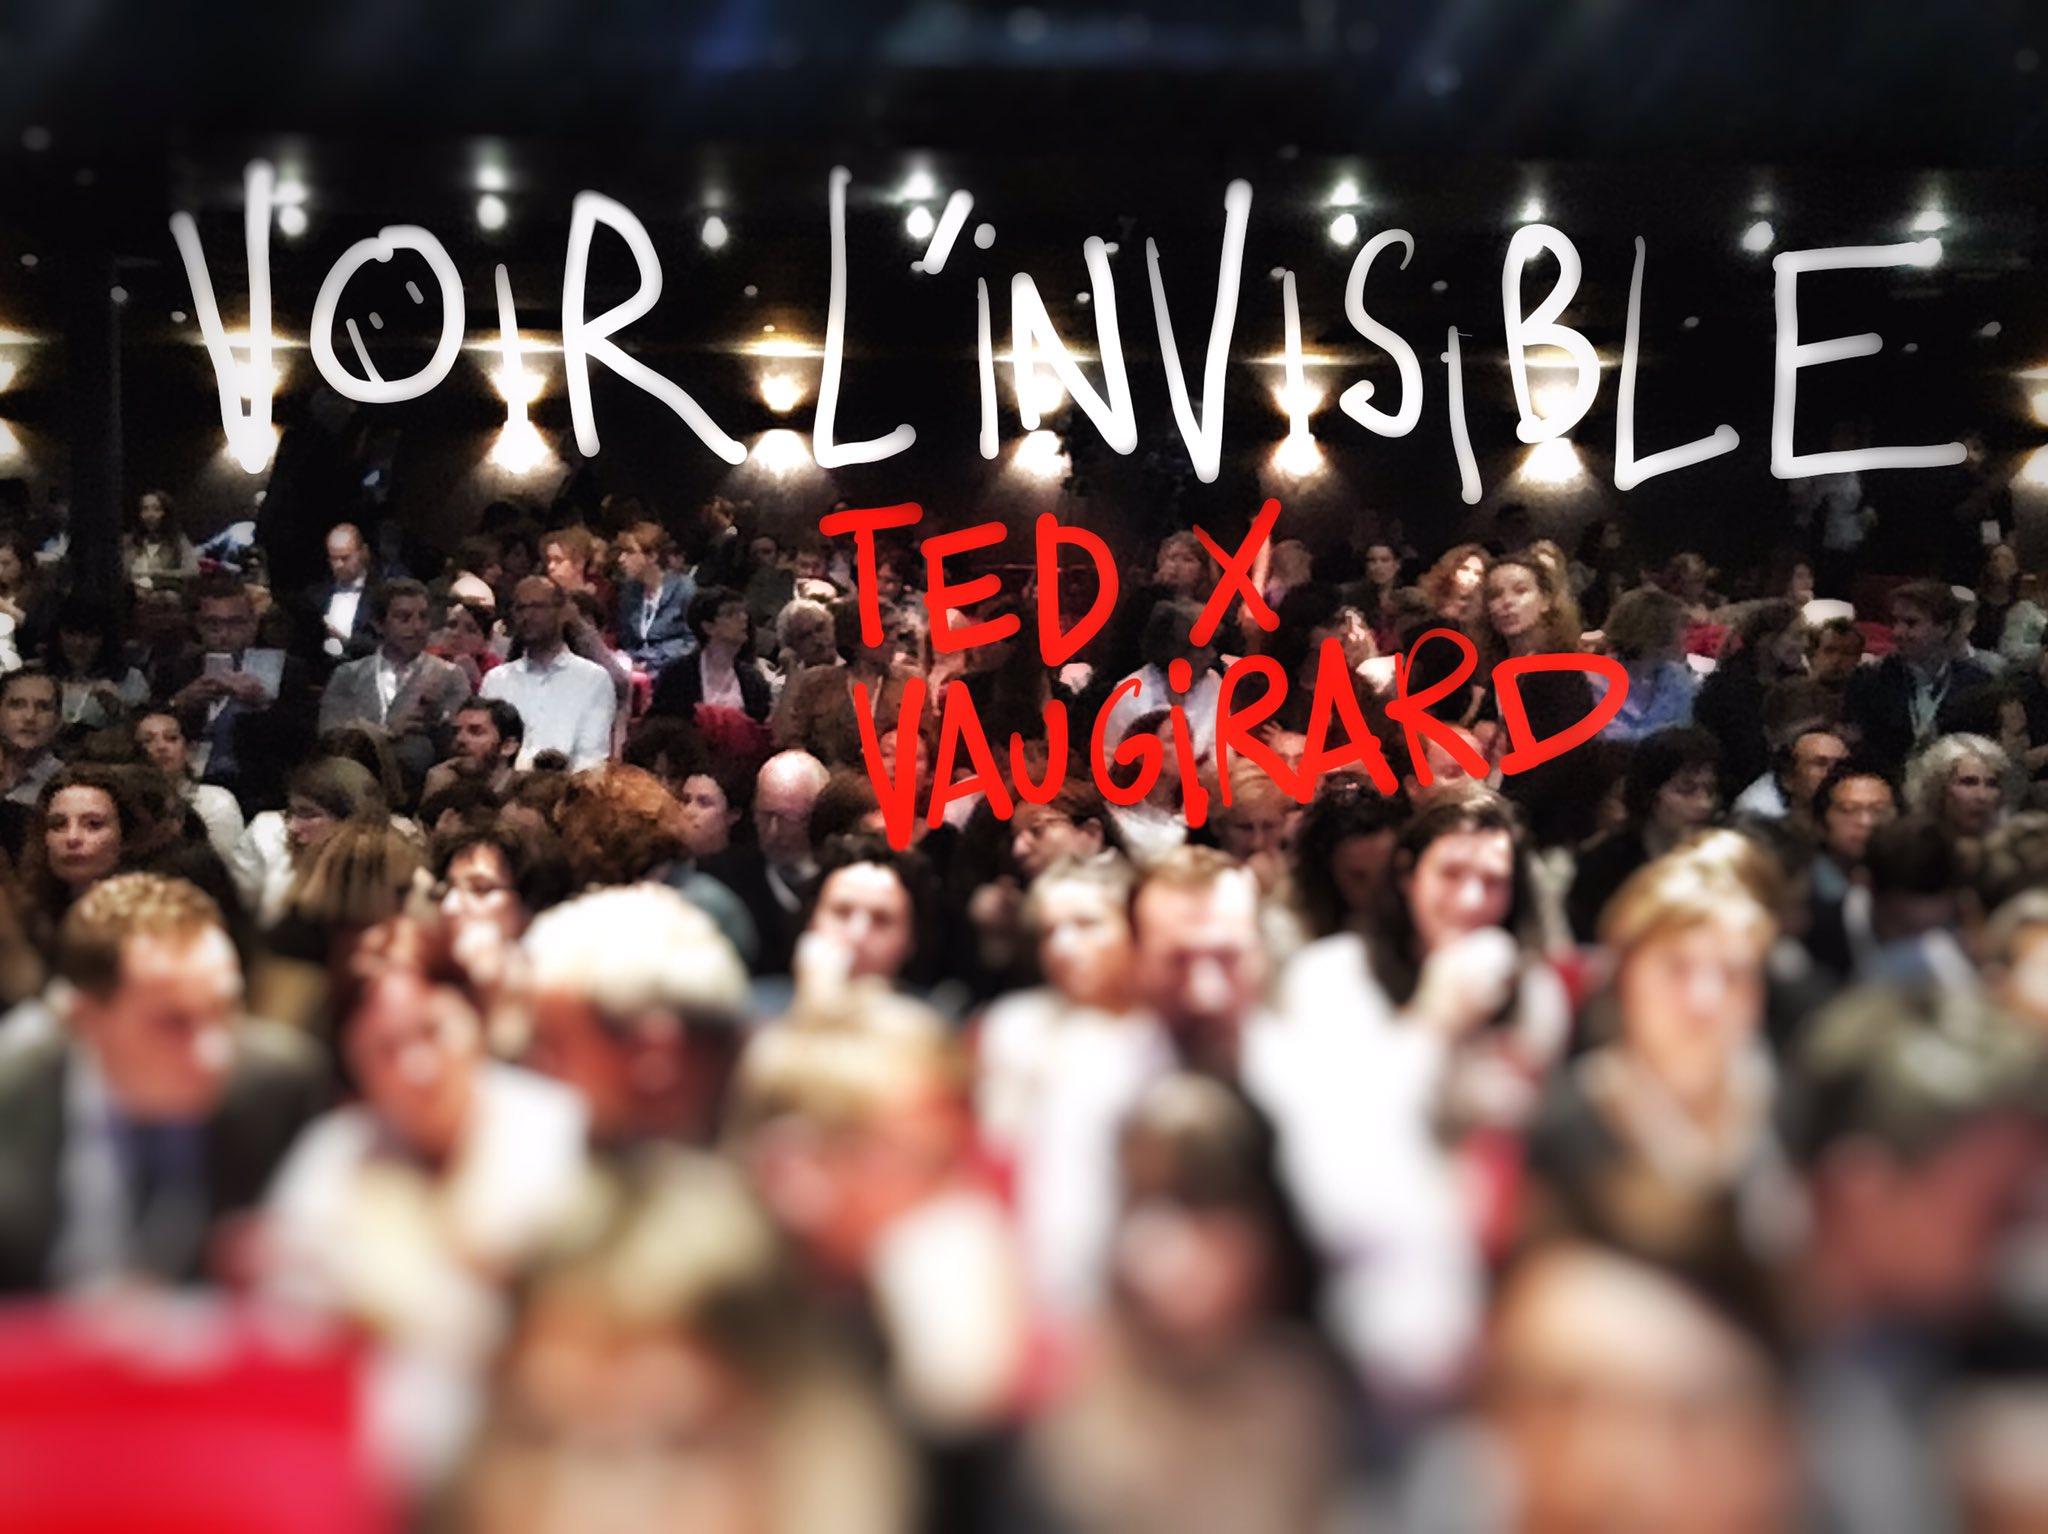 TEDx Vaugirard va bientôt se rendre visible... En live stream #TEDxVR #TEDxVR2016 https://t.co/6wLRZIqcRh